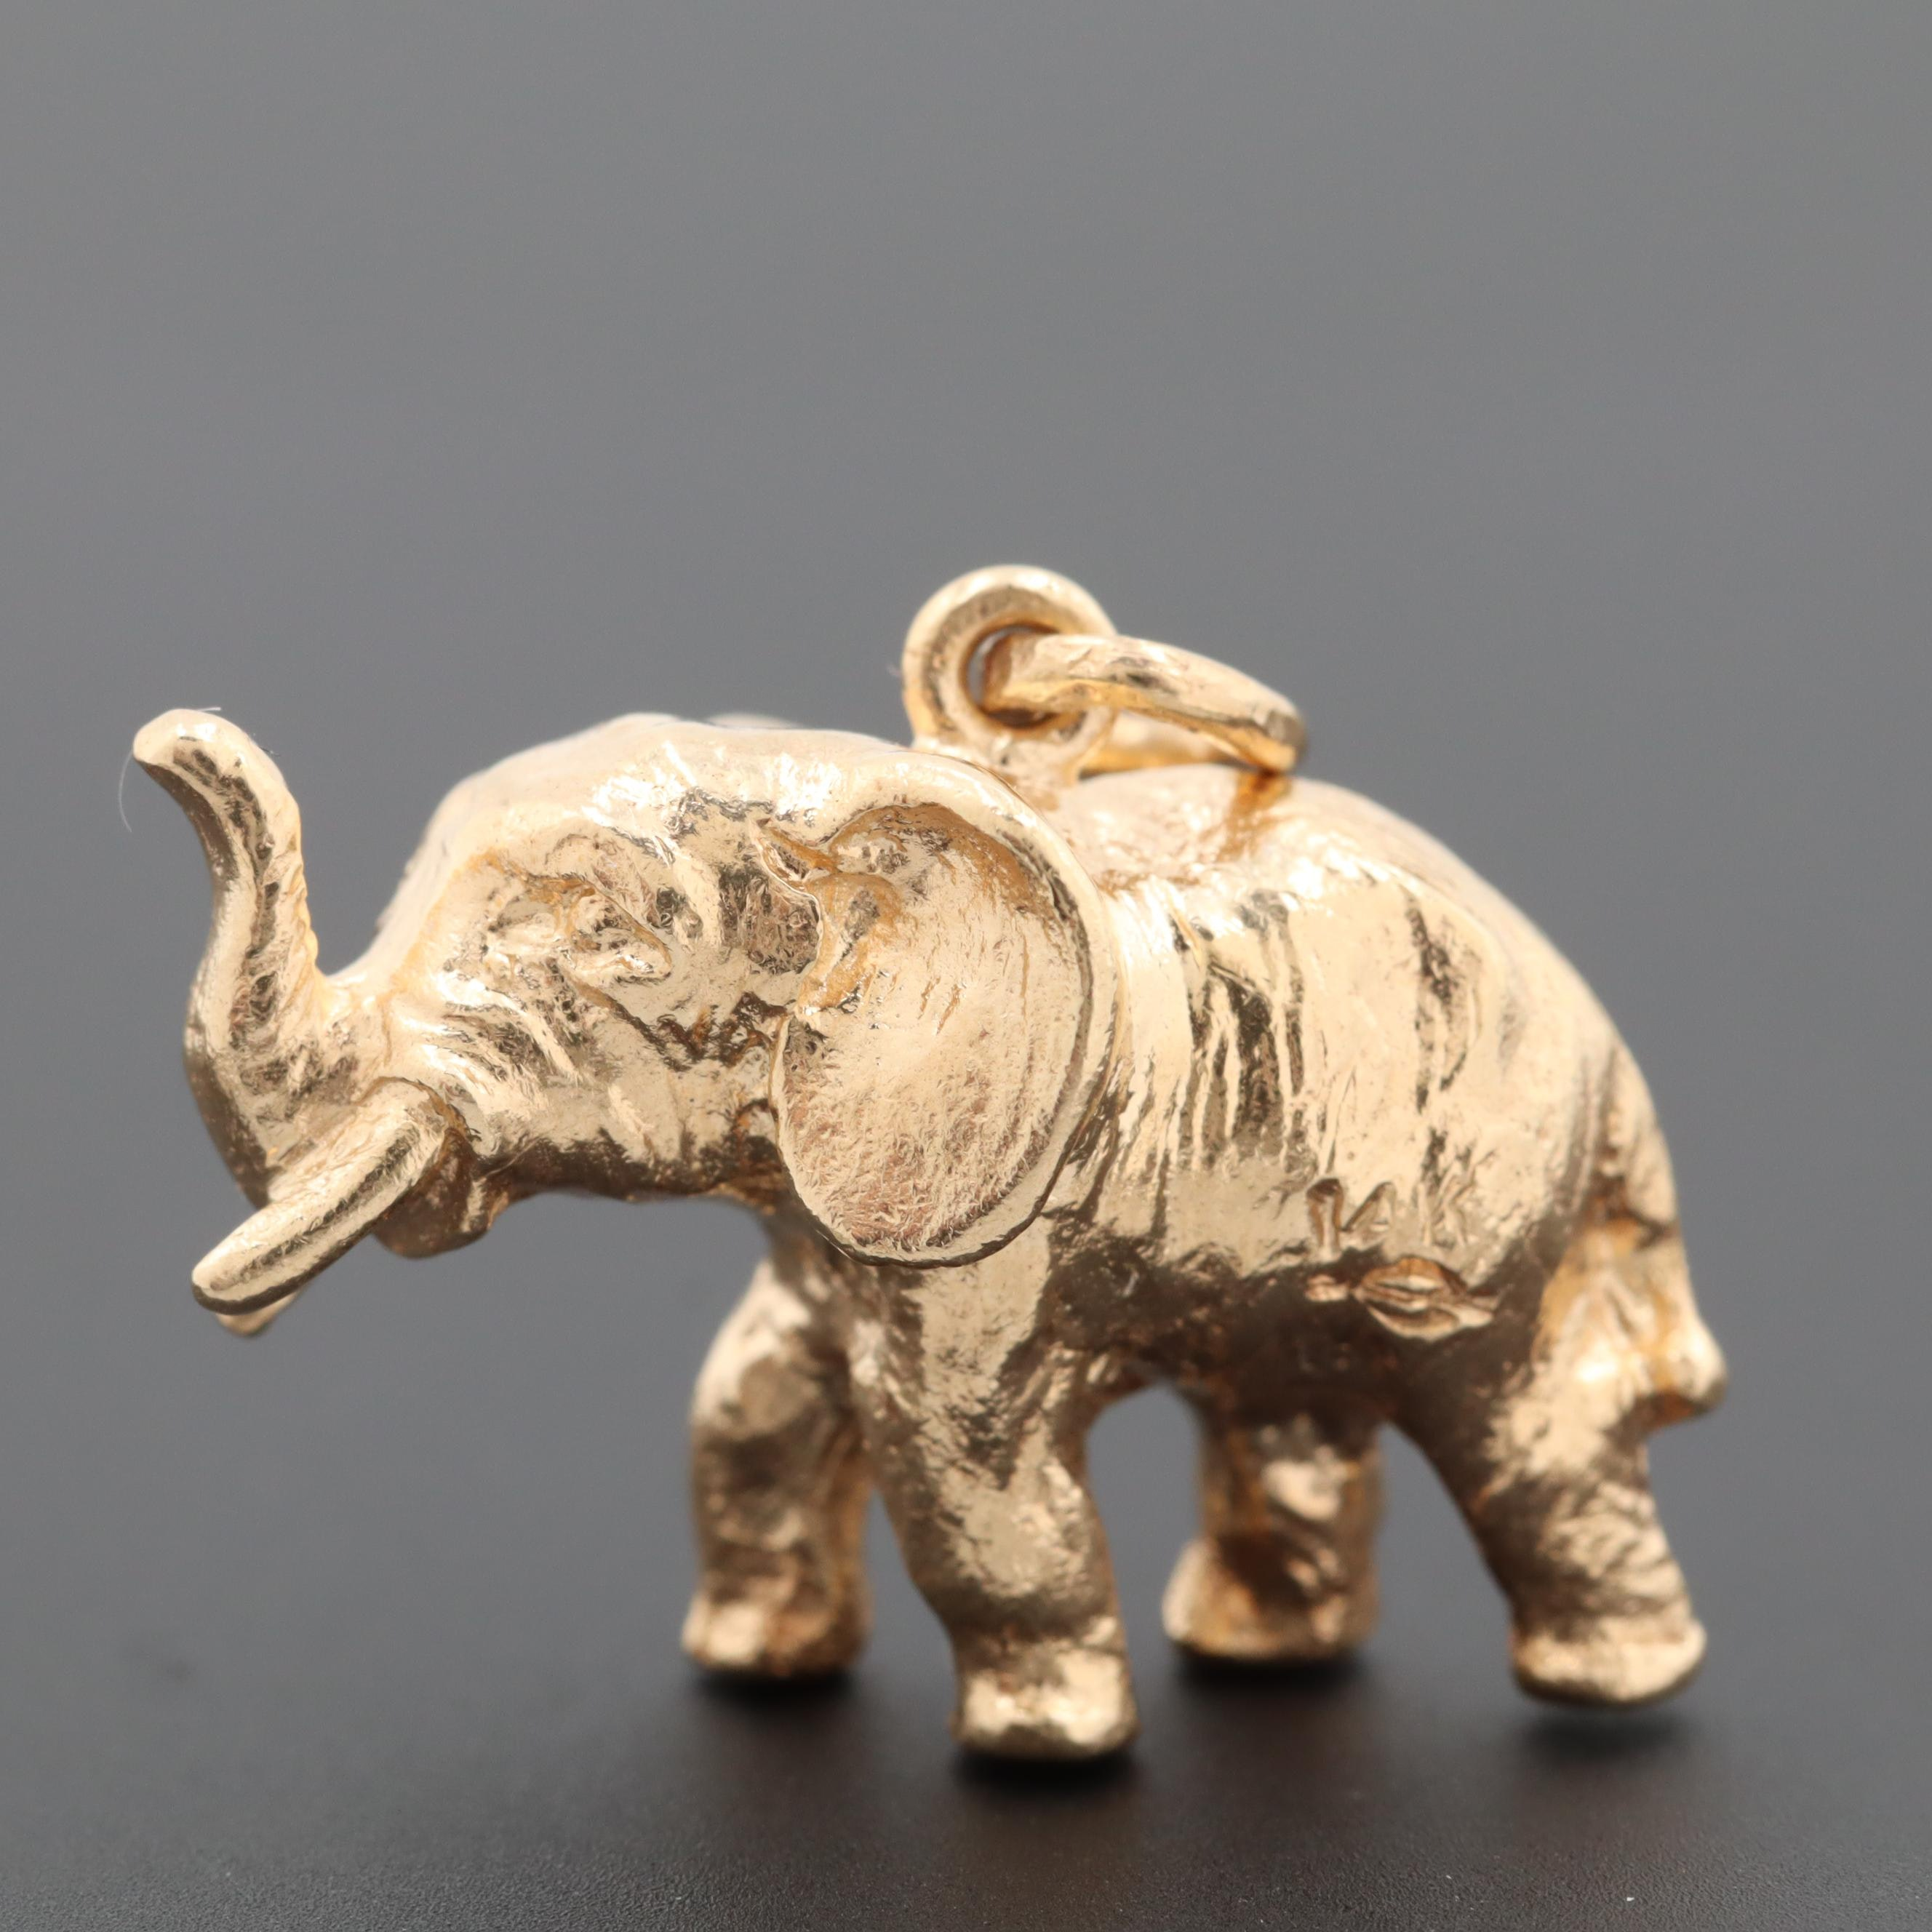 14K Yellow Gold Lucky Elephant Charm Pendant